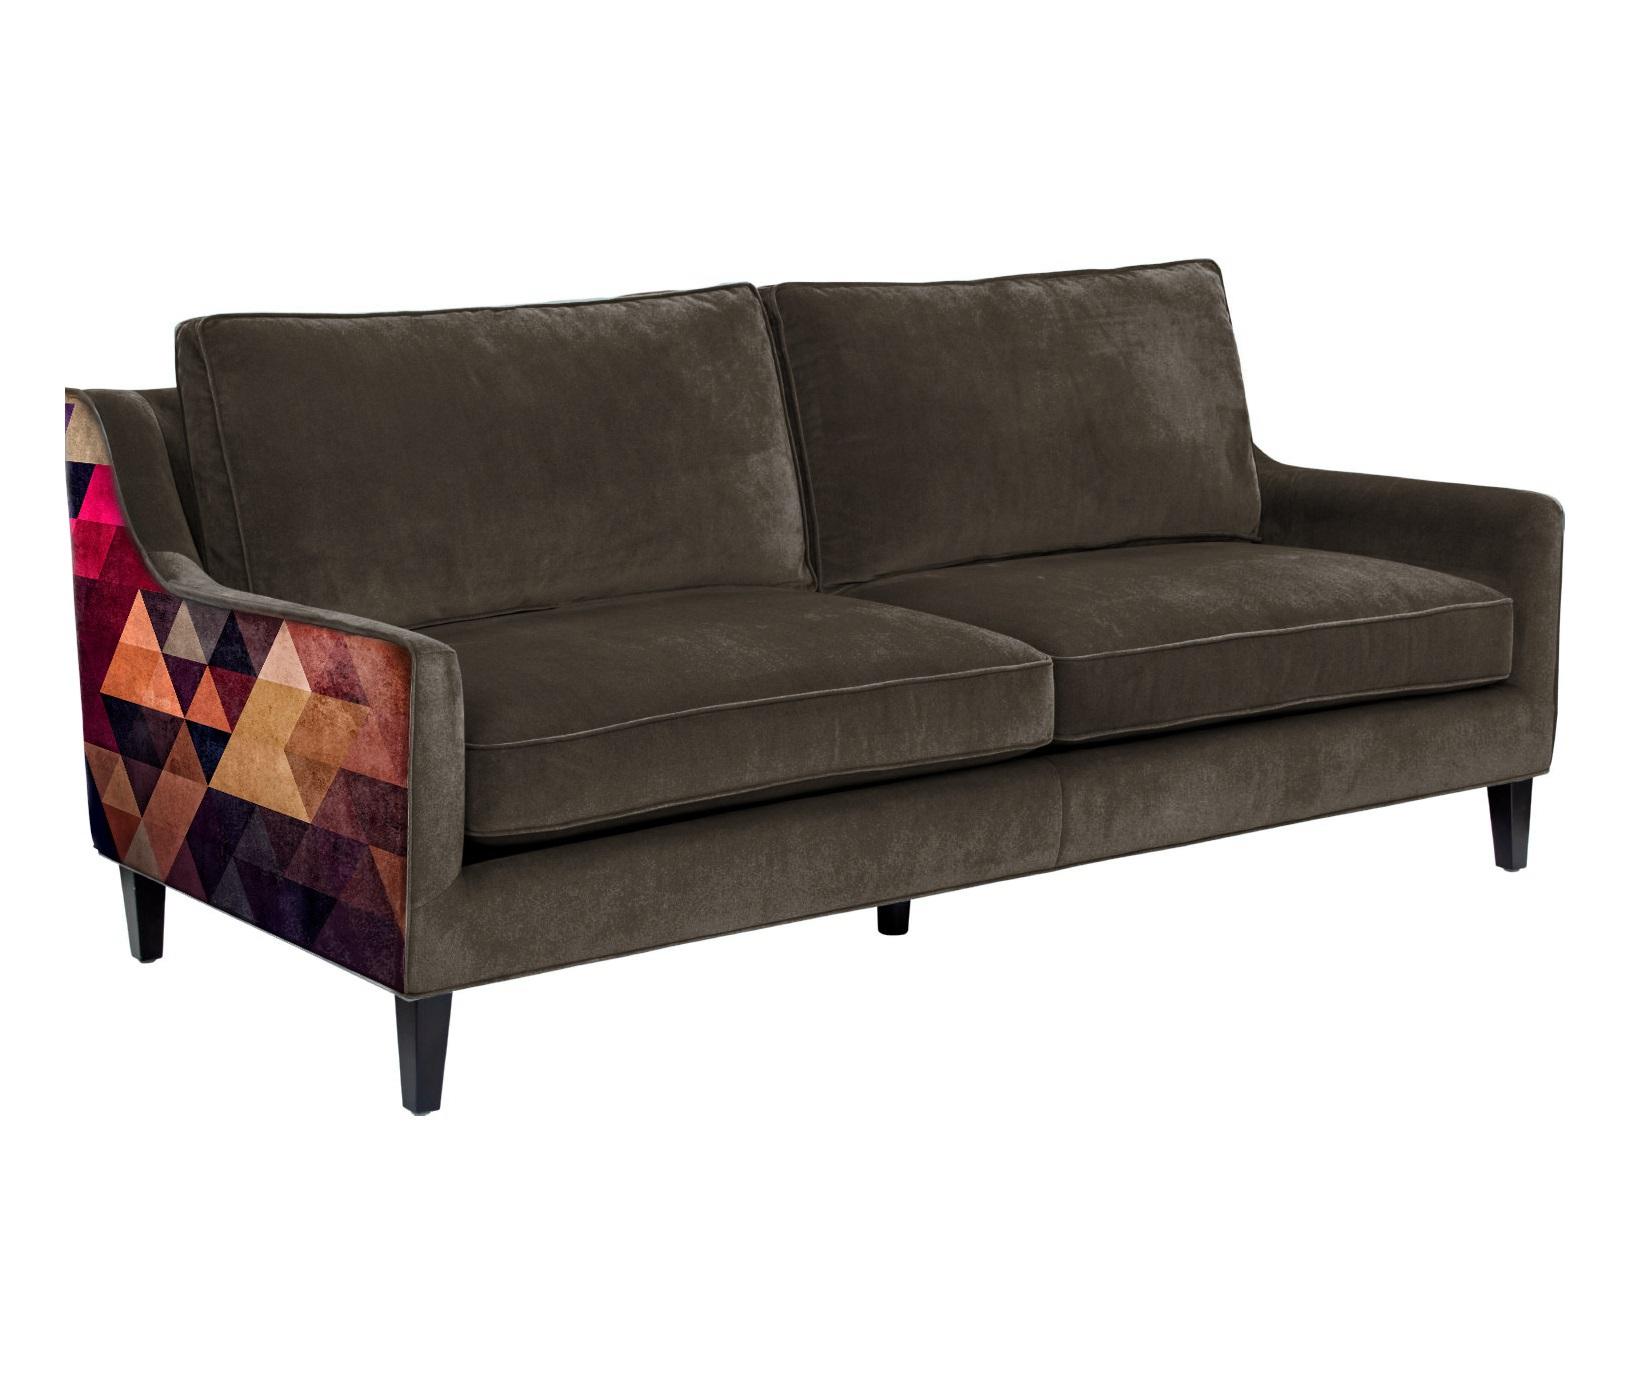 Icon designe диван triangle коричневый  65835/5